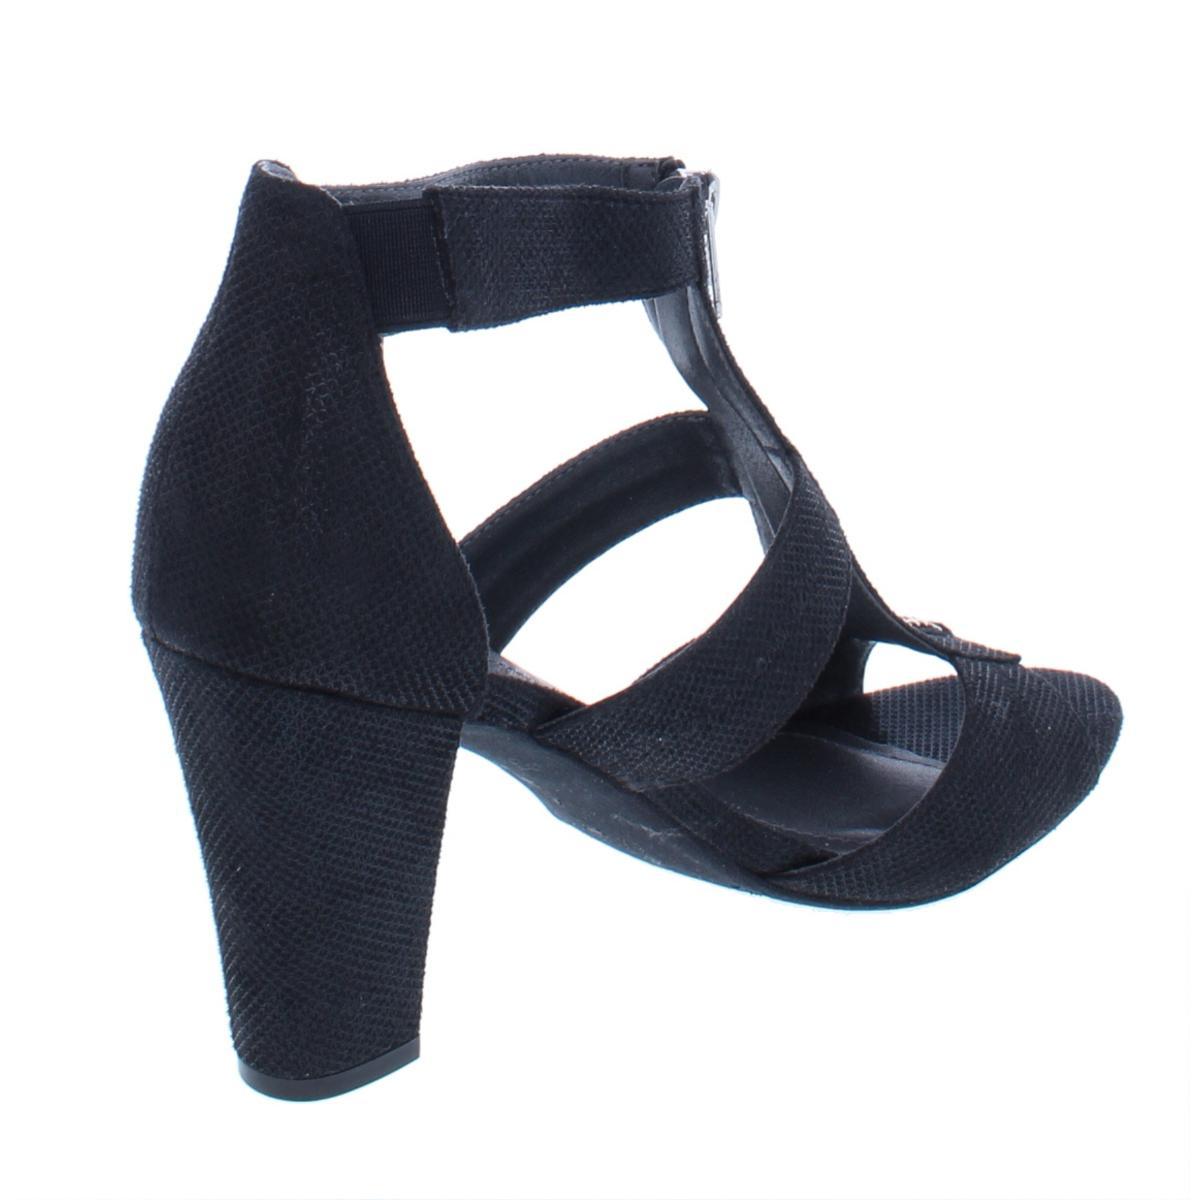 Rialto-Womens-Ritz-Open-Toe-Block-Heels-Evening-BHFO-8083 thumbnail 4